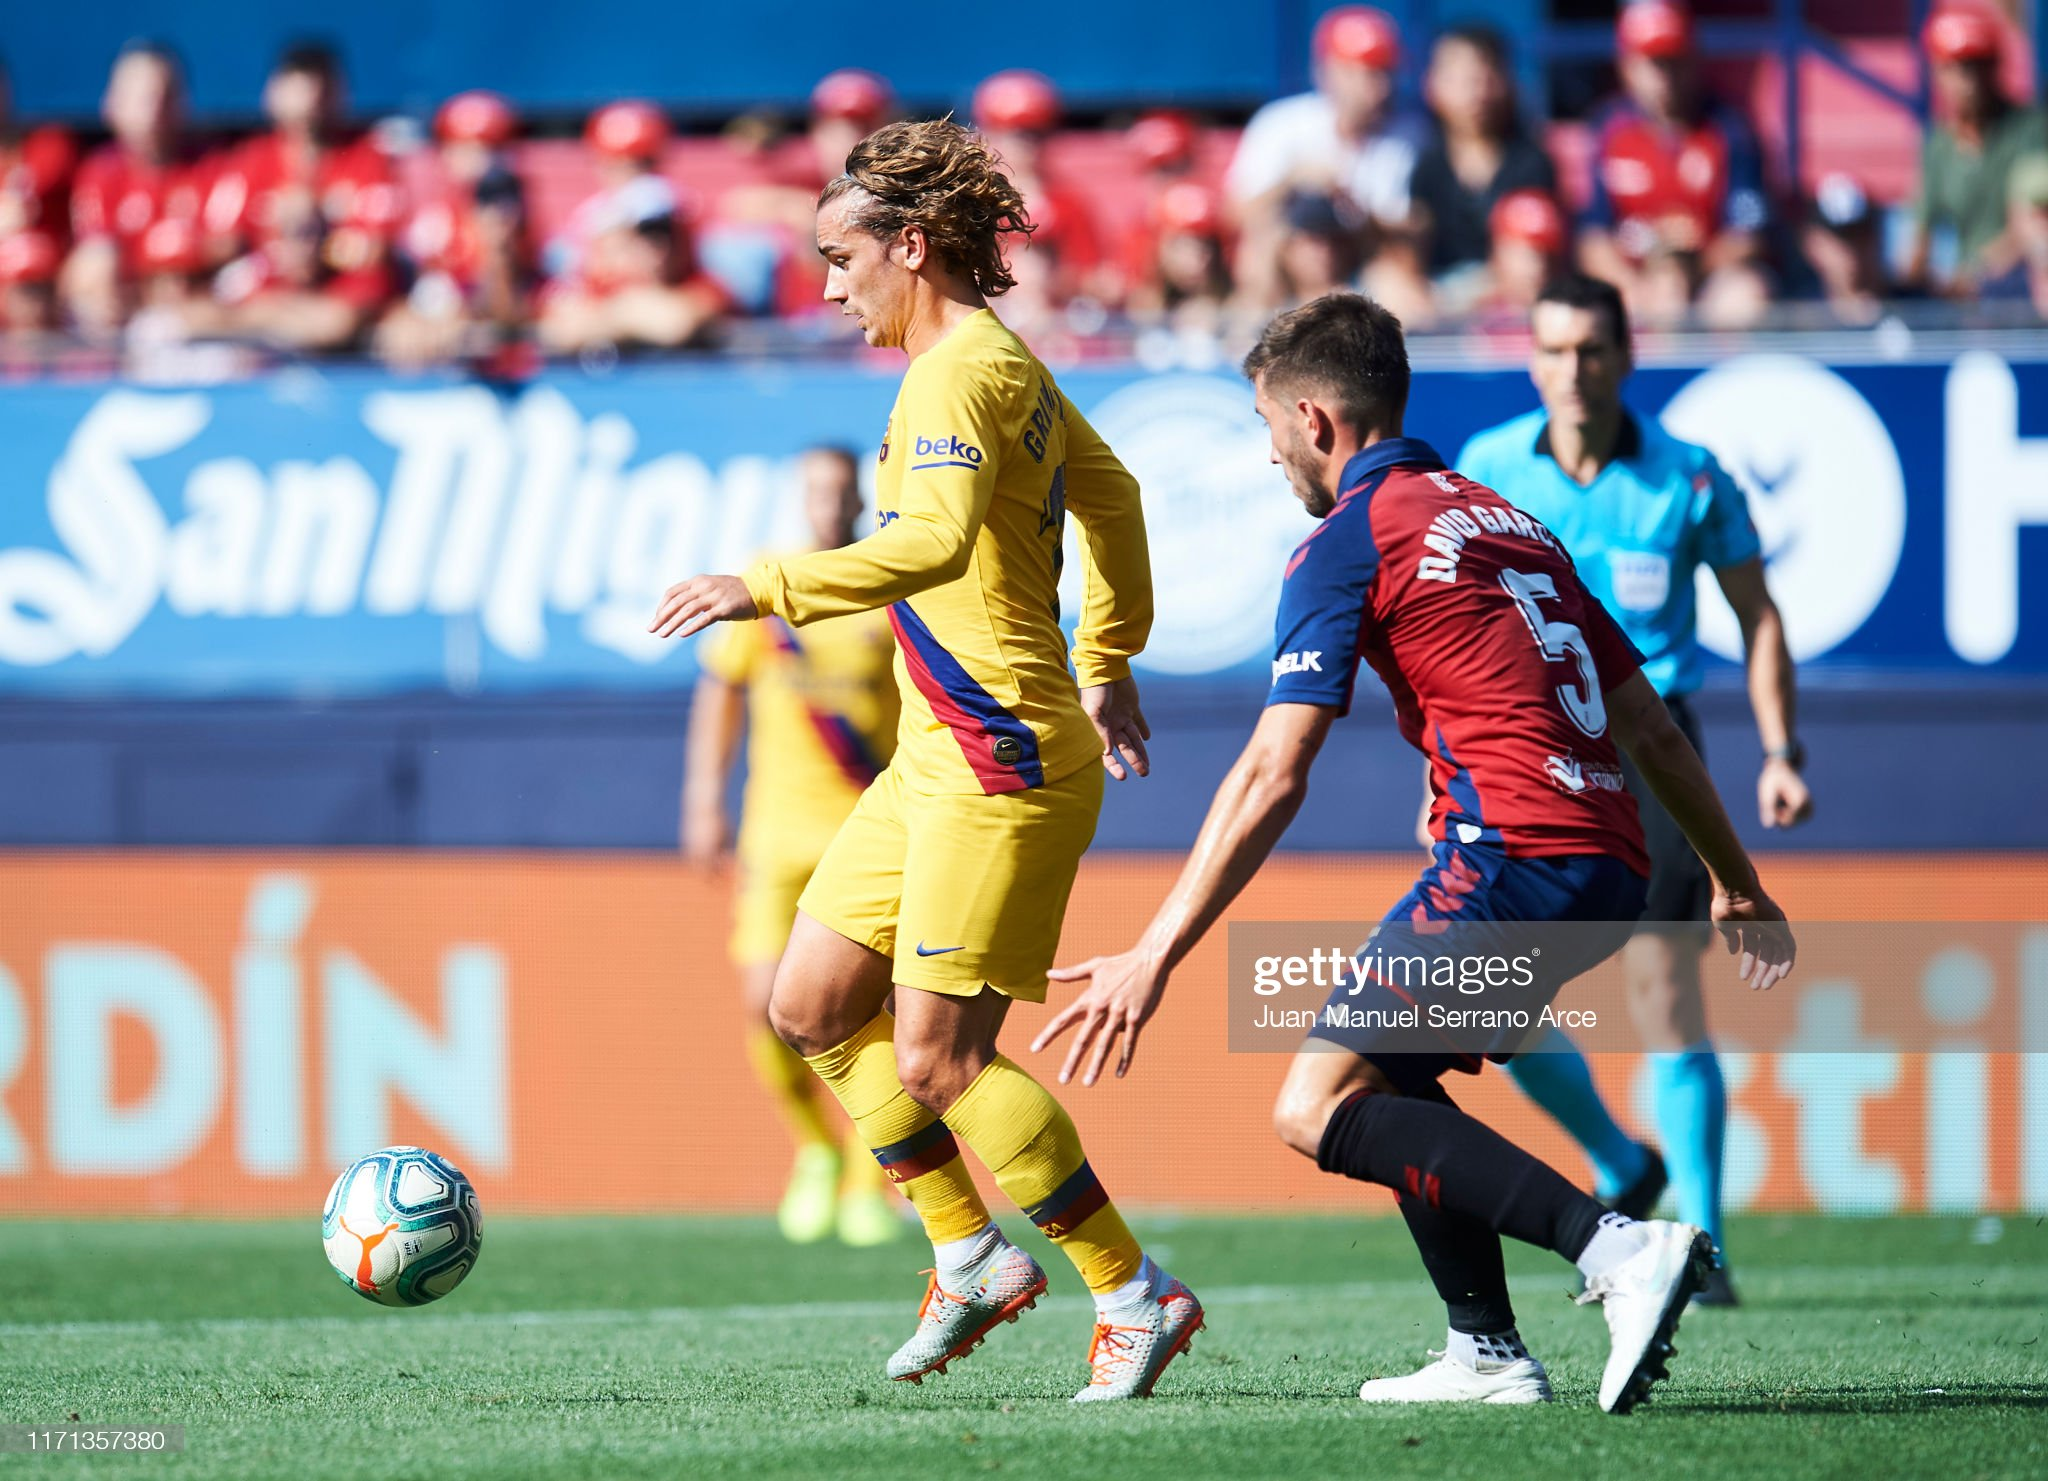 صور مباراة : أوساسونا - برشلونة 2-2 ( 31-08-2019 )  David-garcia-of-ca-osasuna-competes-for-the-ball-with-antoine-of-fc-picture-id1171357380?s=2048x2048